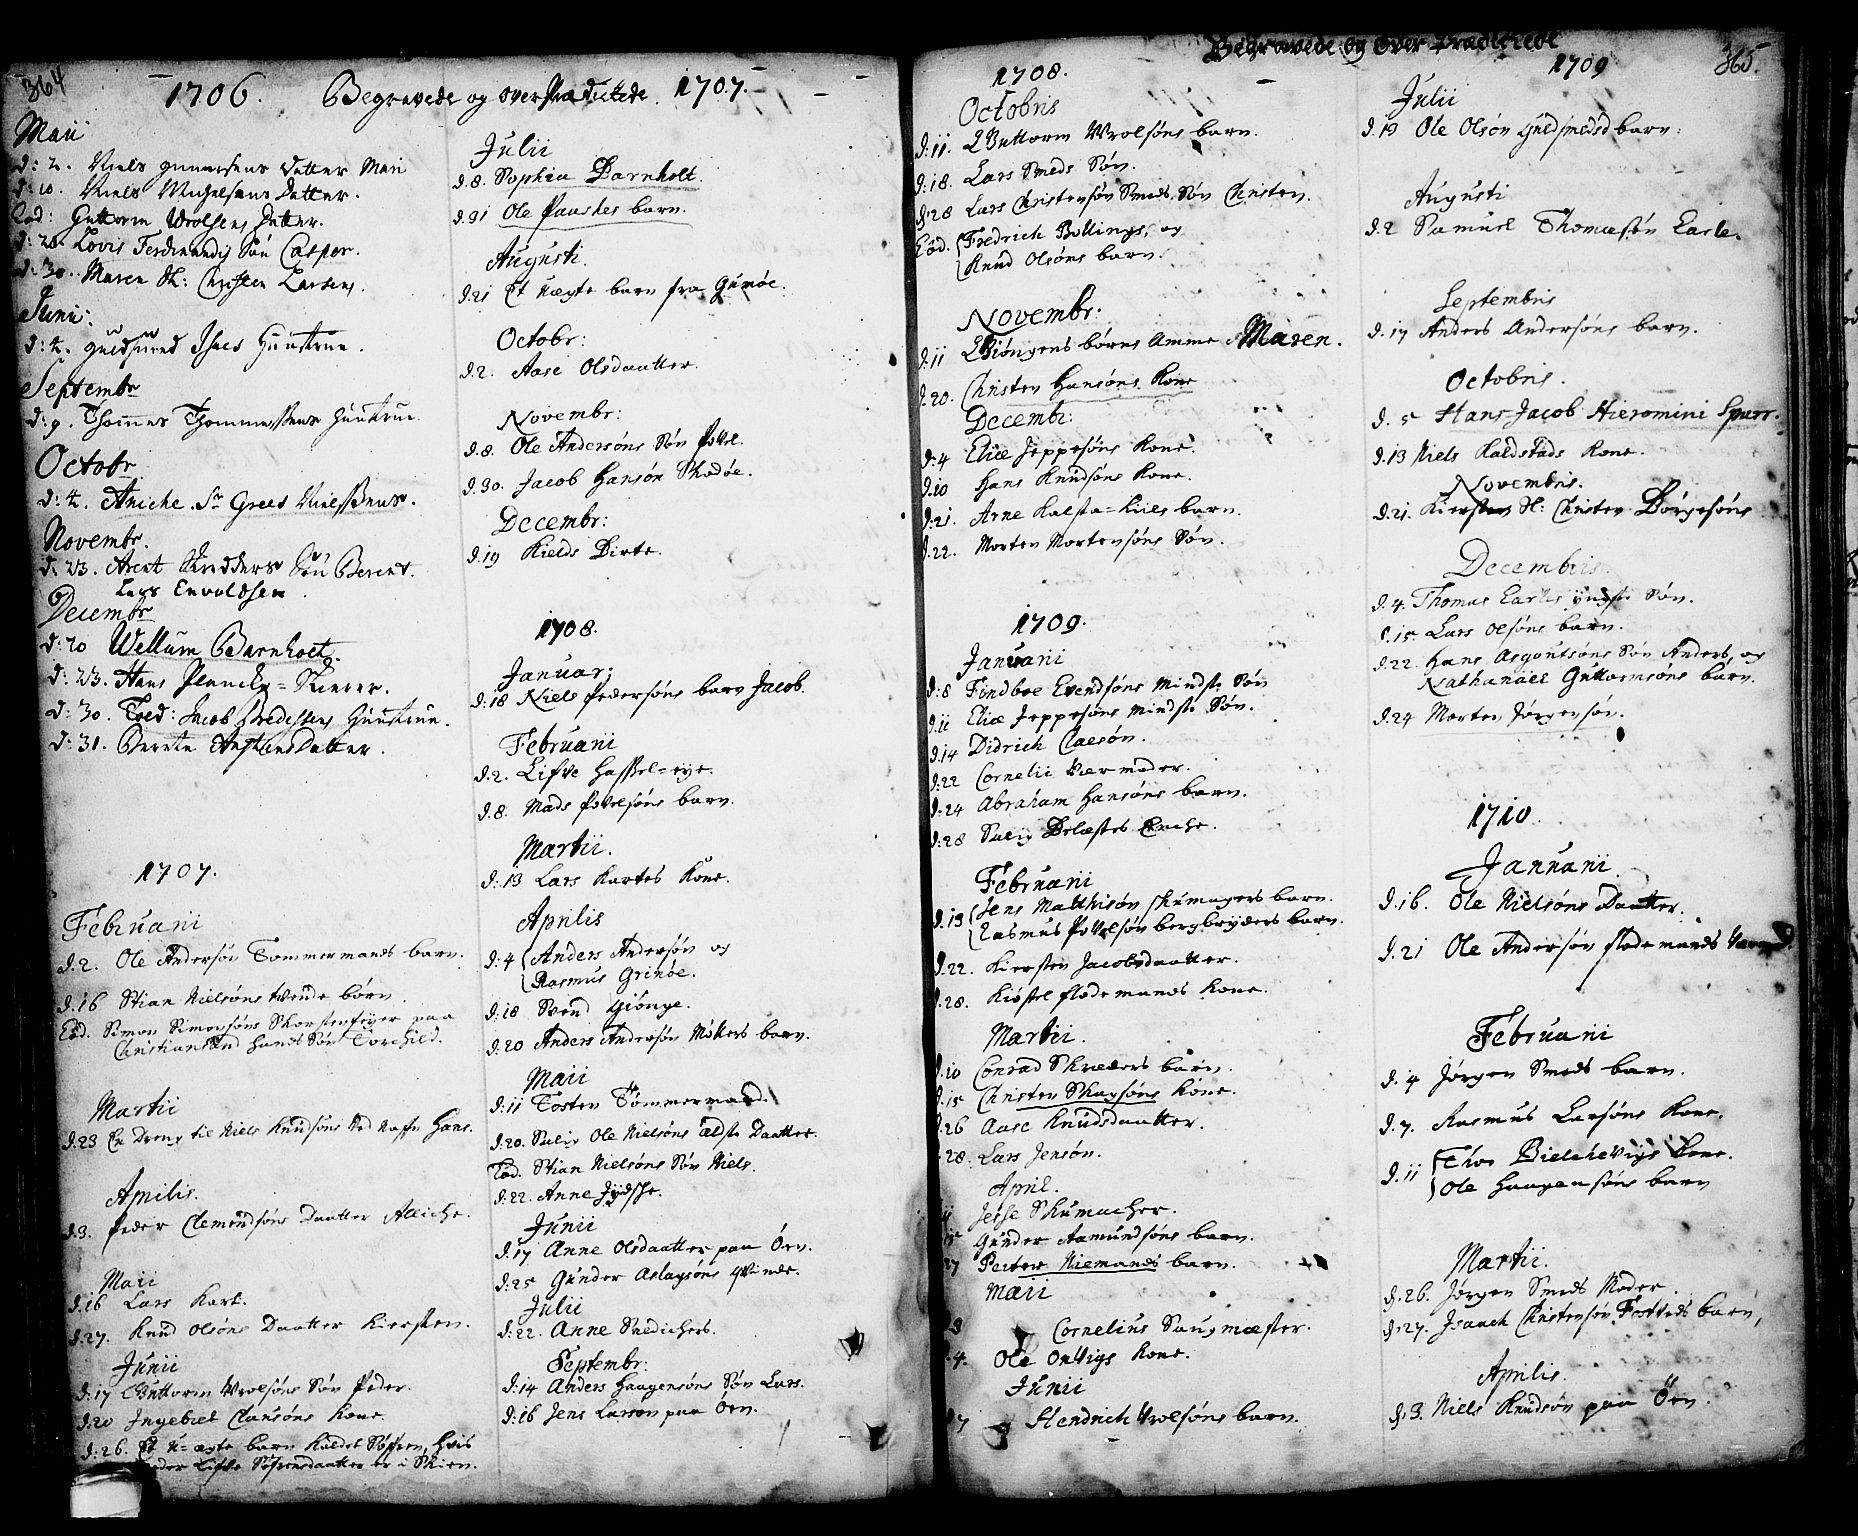 SAKO, Kragerø kirkebøker, F/Fa/L0001: Ministerialbok nr. 1, 1702-1766, s. 364-365